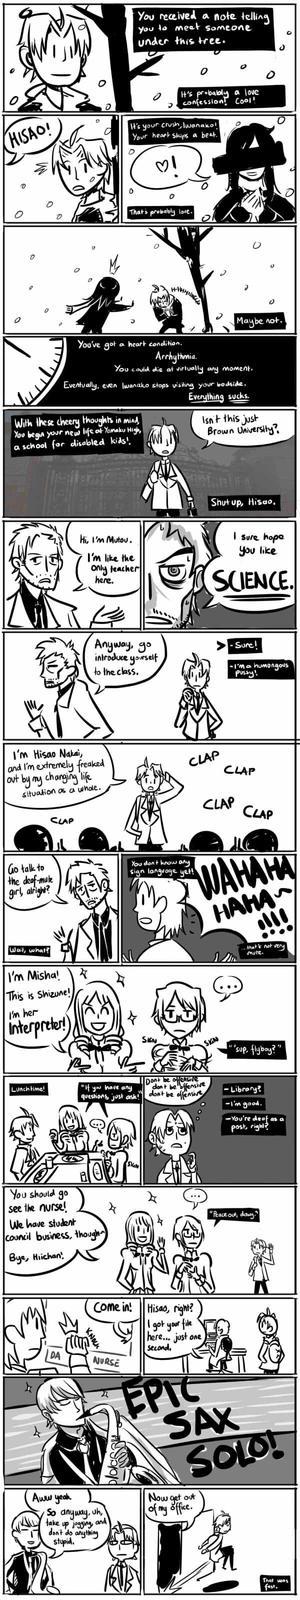 Jintor KS comic part 1